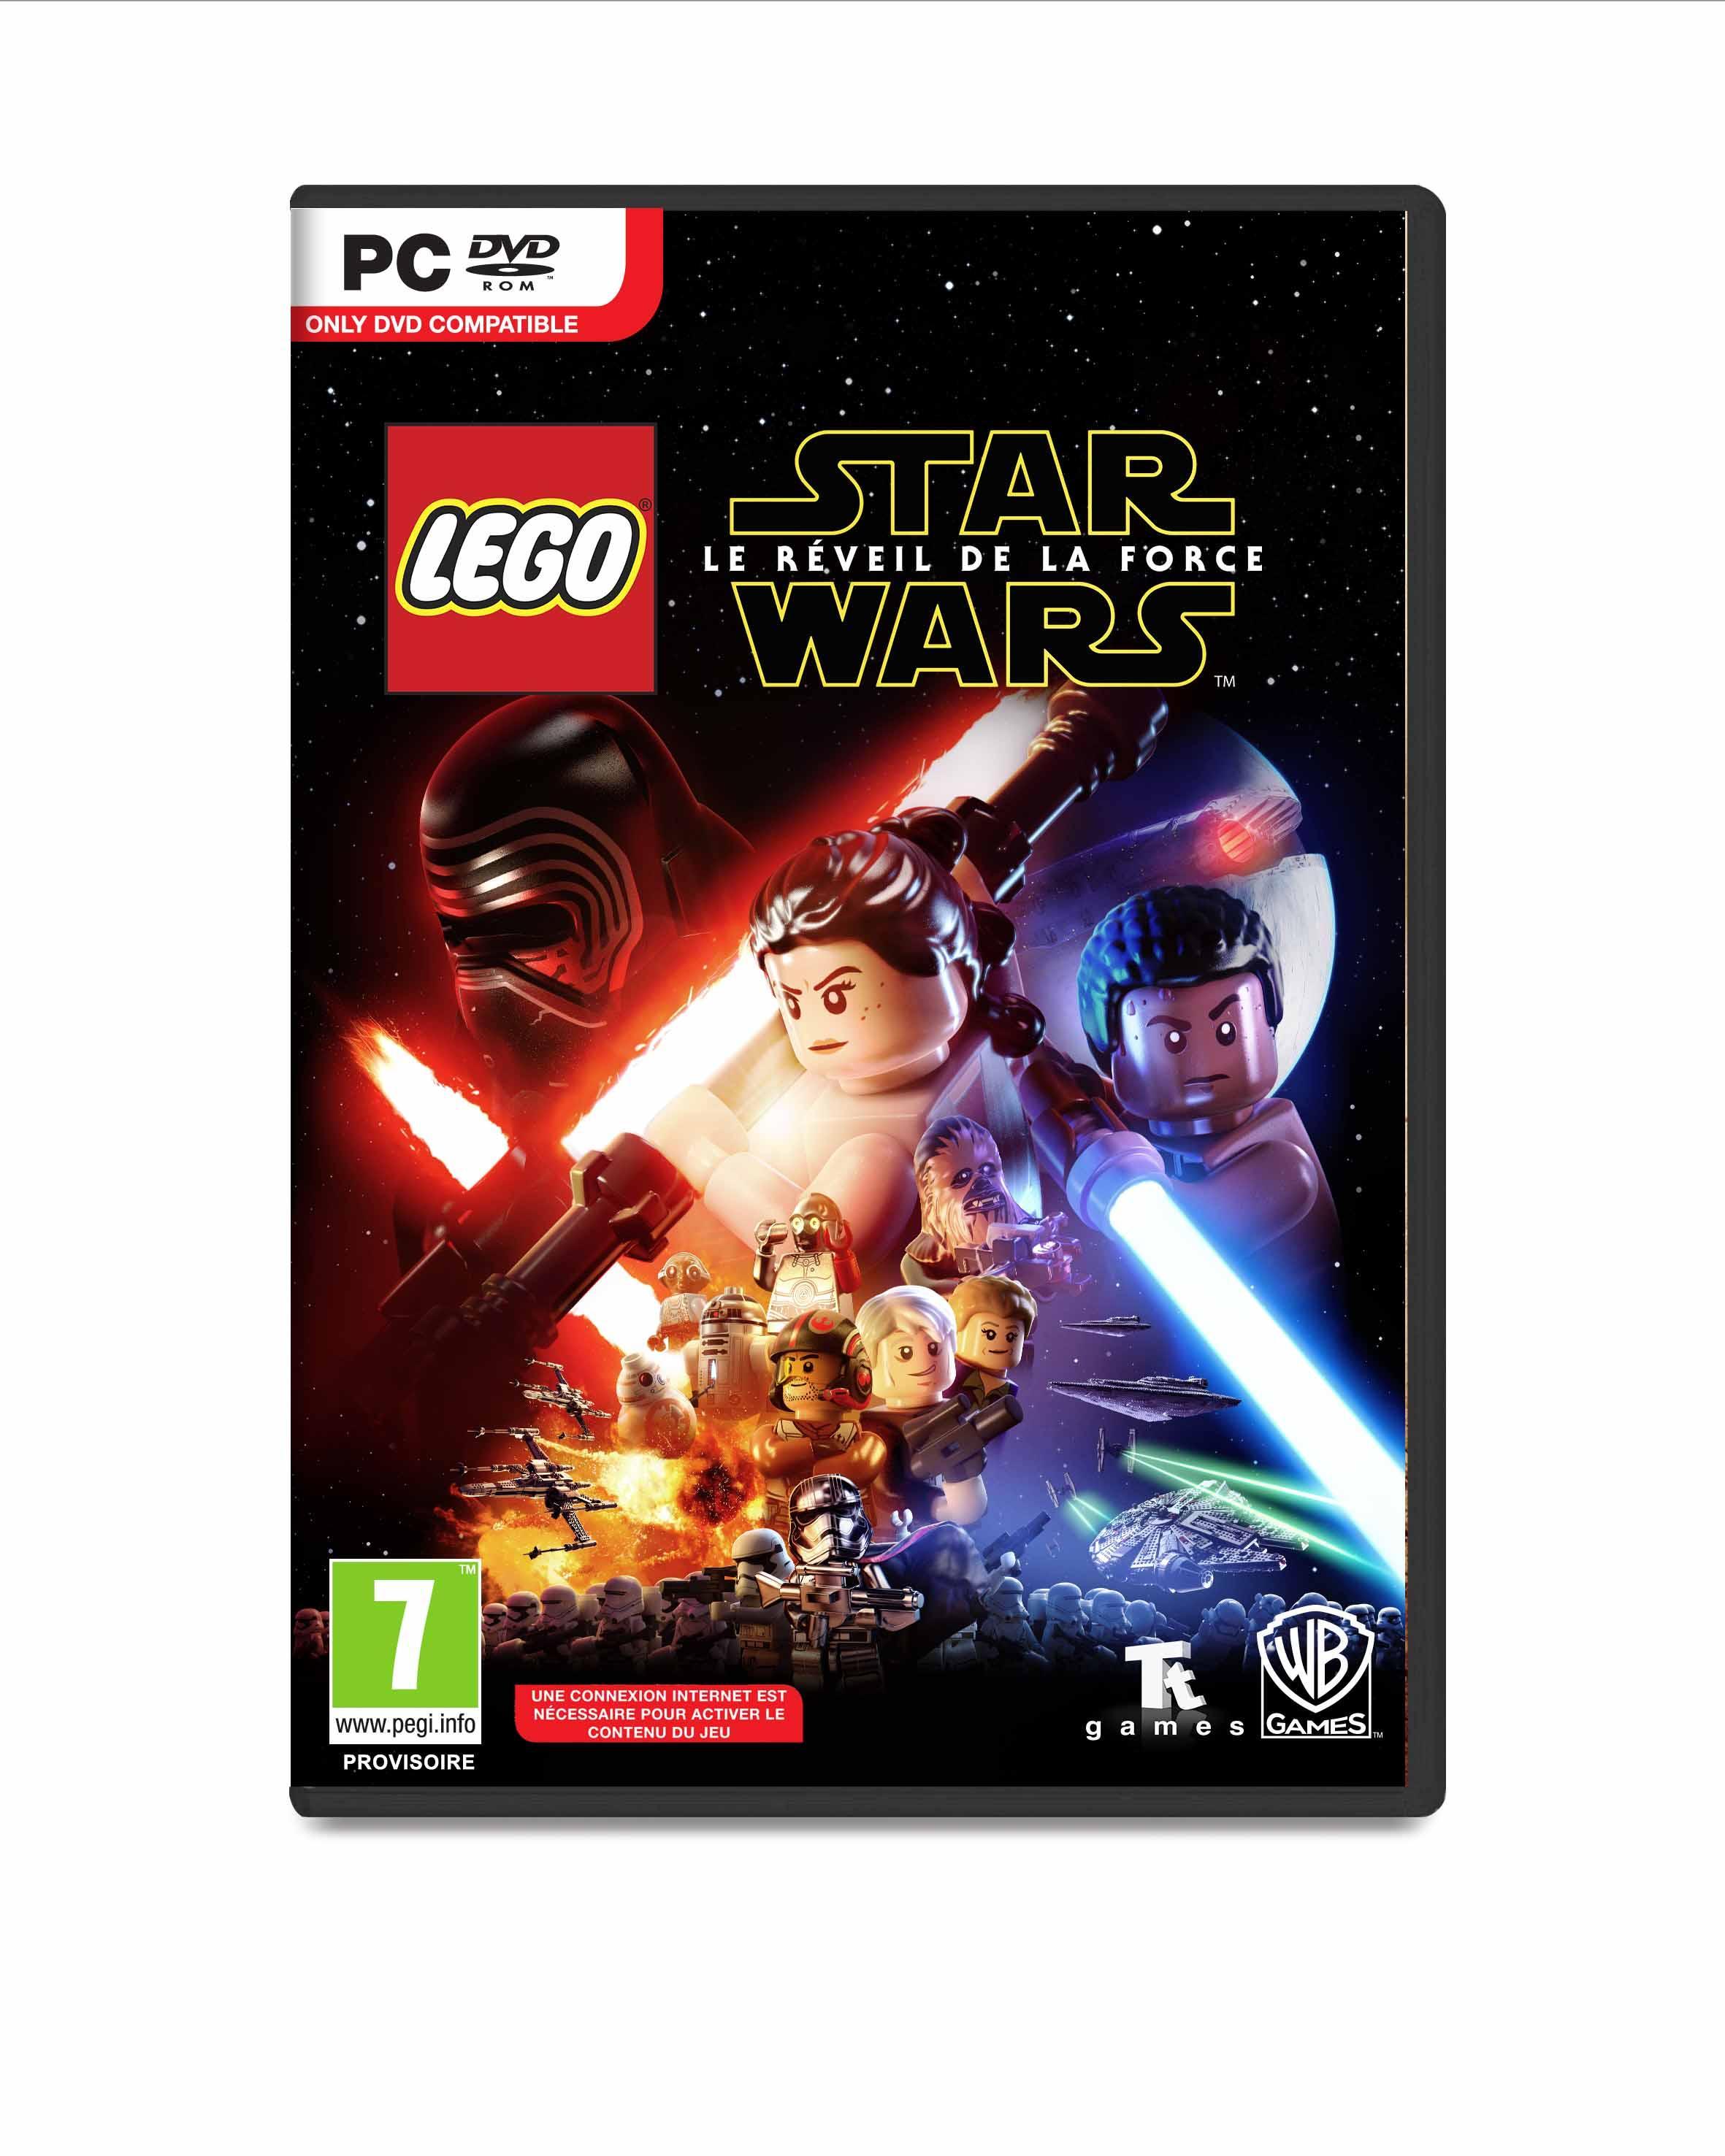 Bros Le Star Force Lego Wars La Warner Réveil De jGSULqzMVp